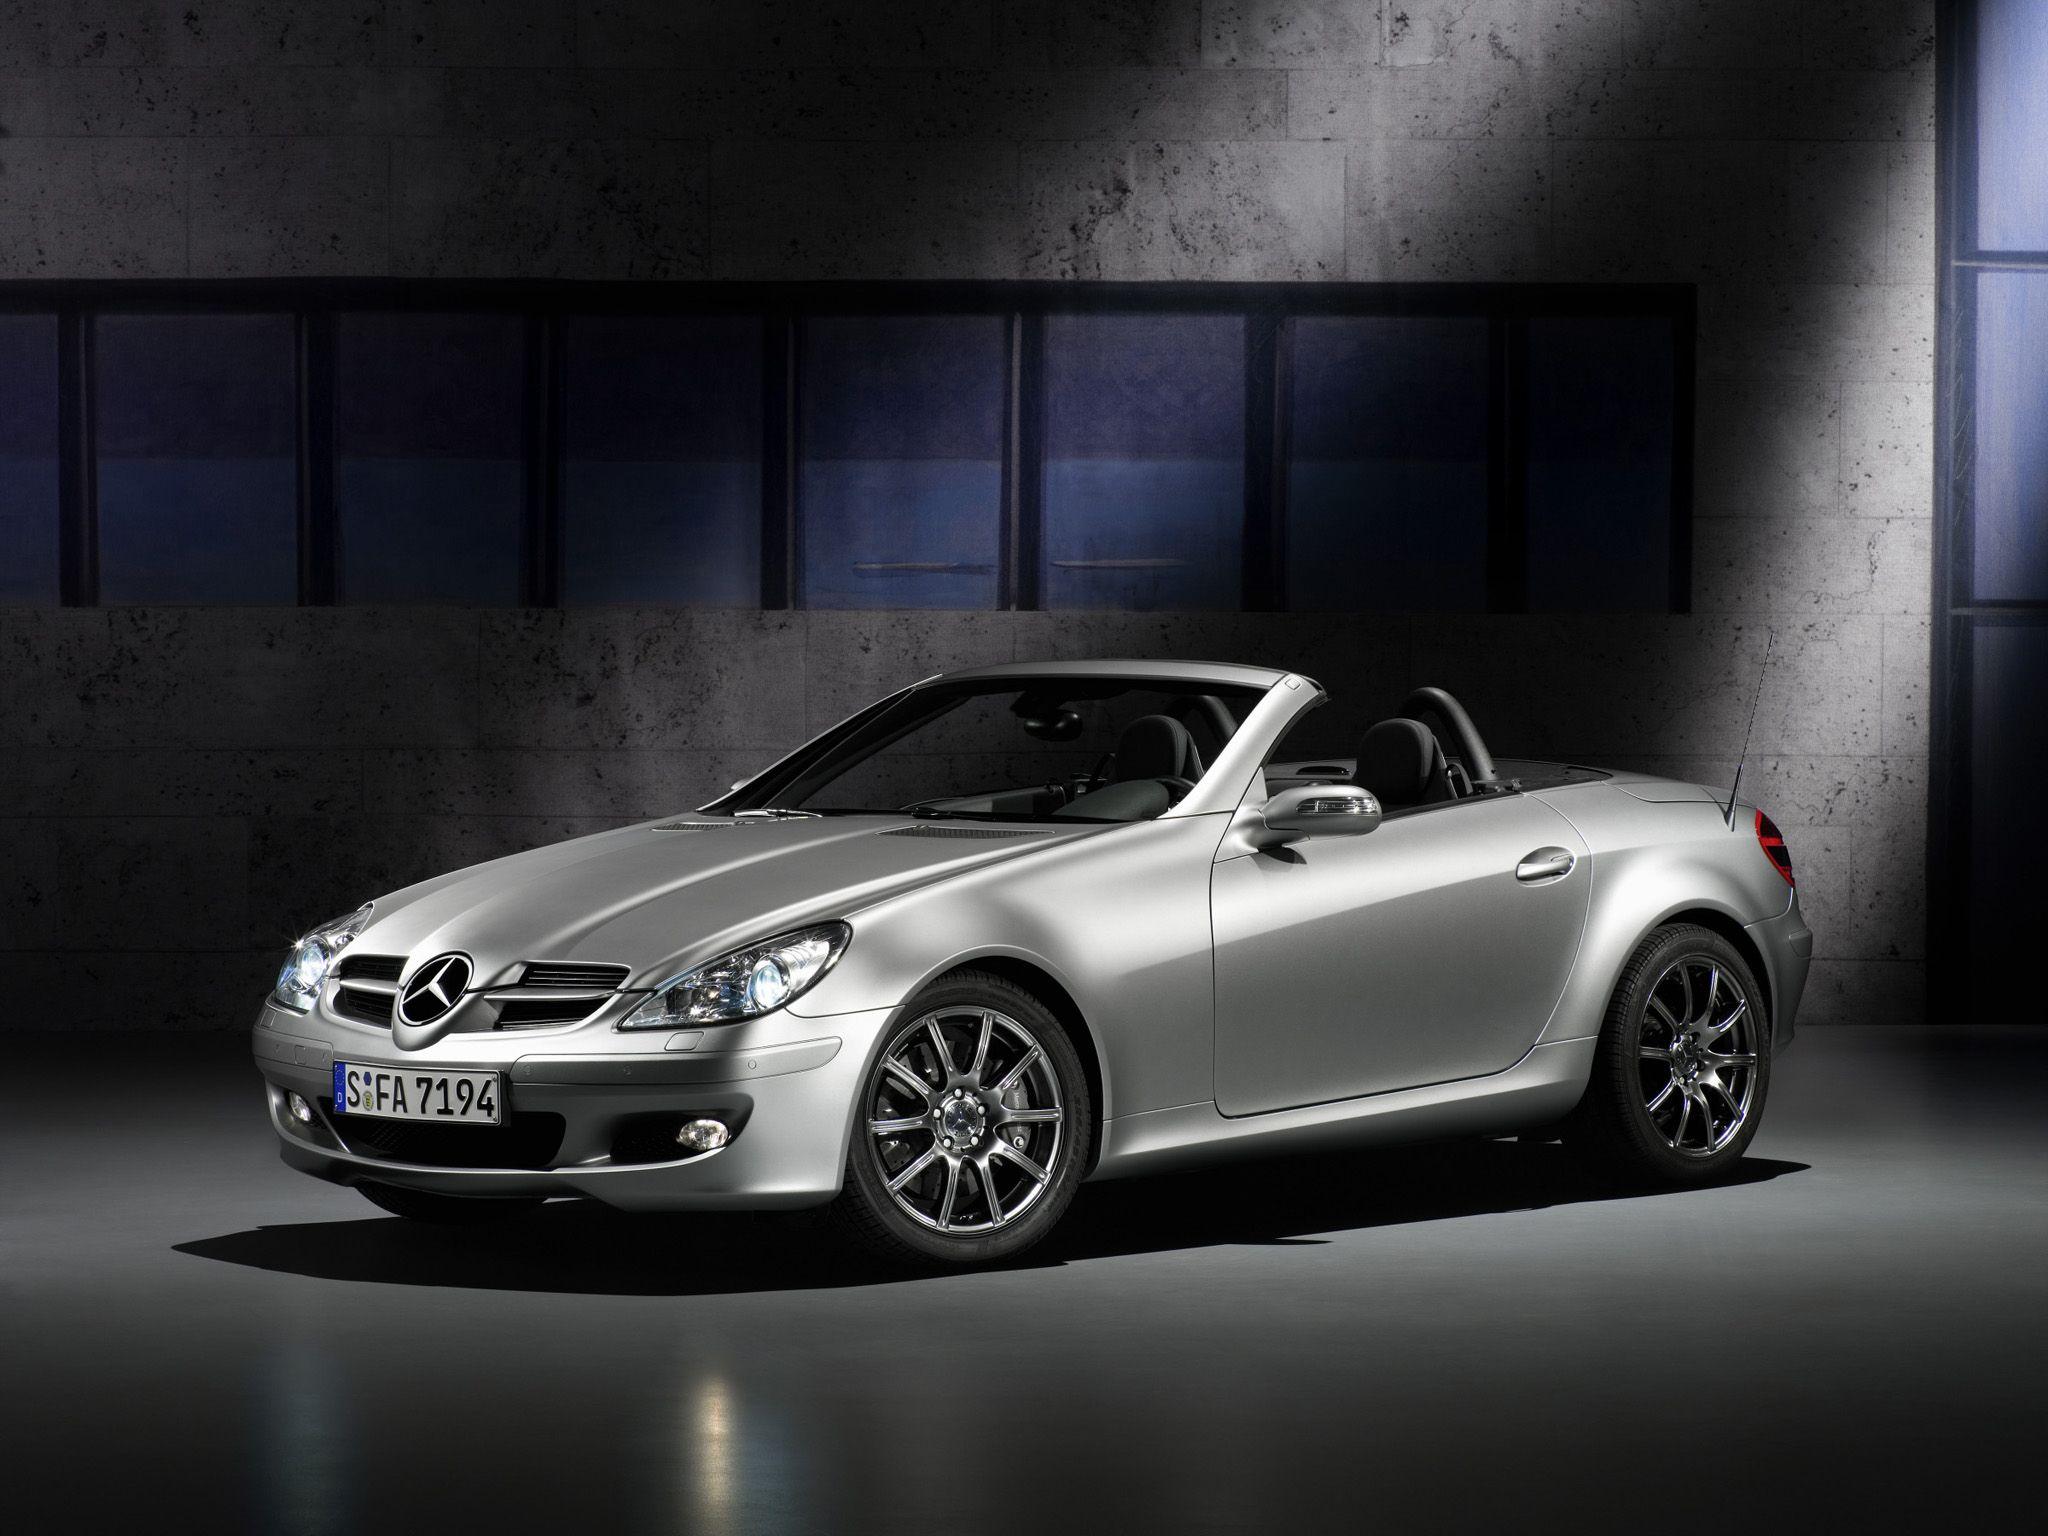 2007 Mercedes Benz Slk Edition 10 Mercedes Slk200 Edition 10